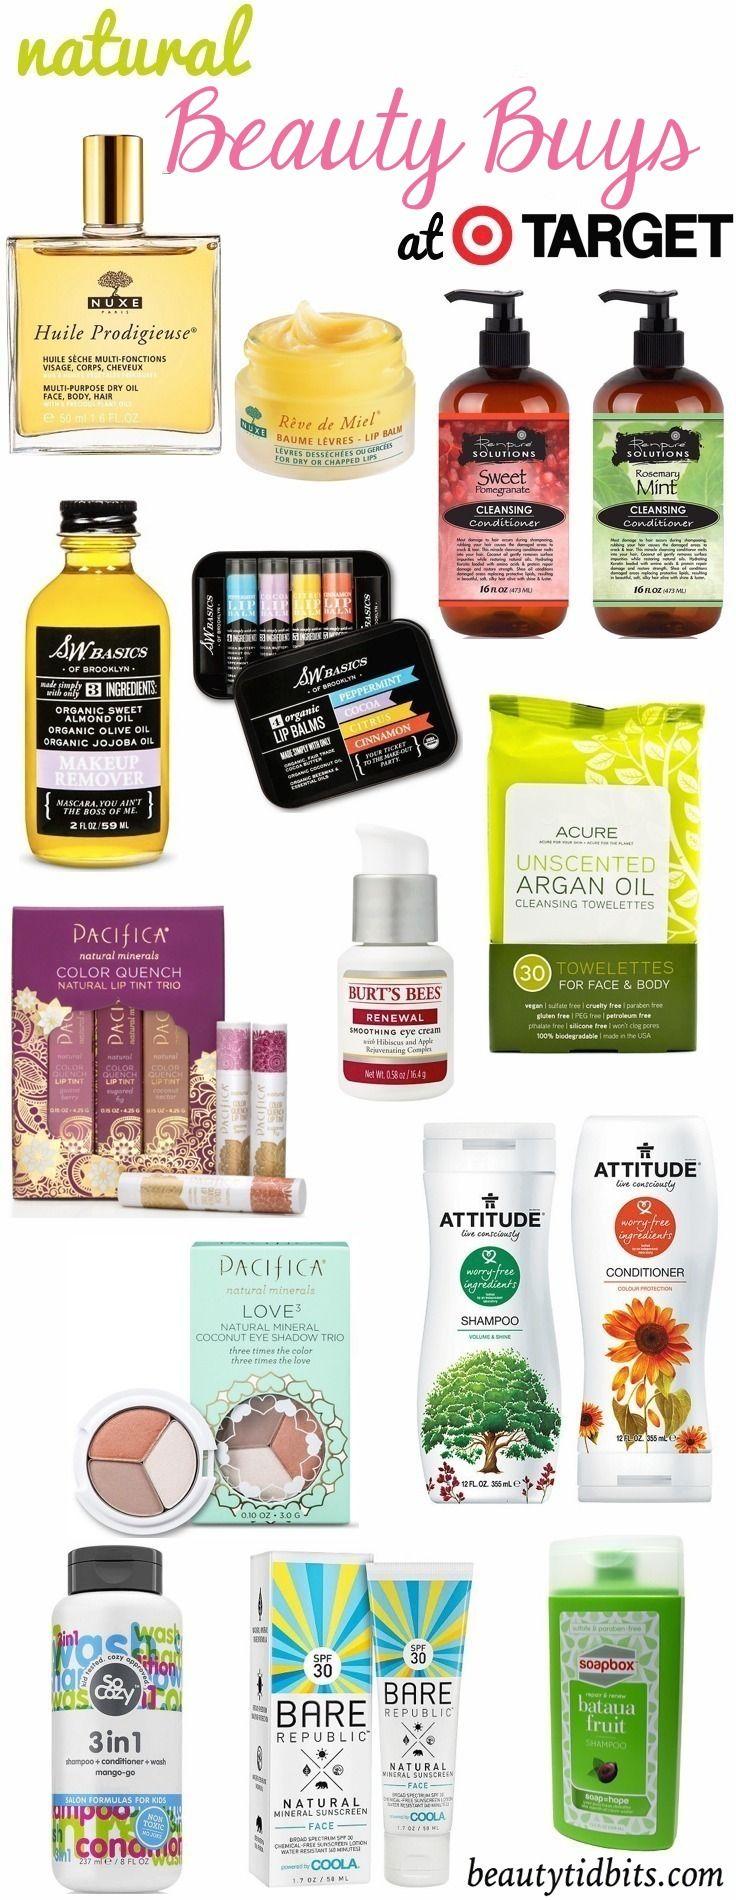 Natural Beauty Products at Target